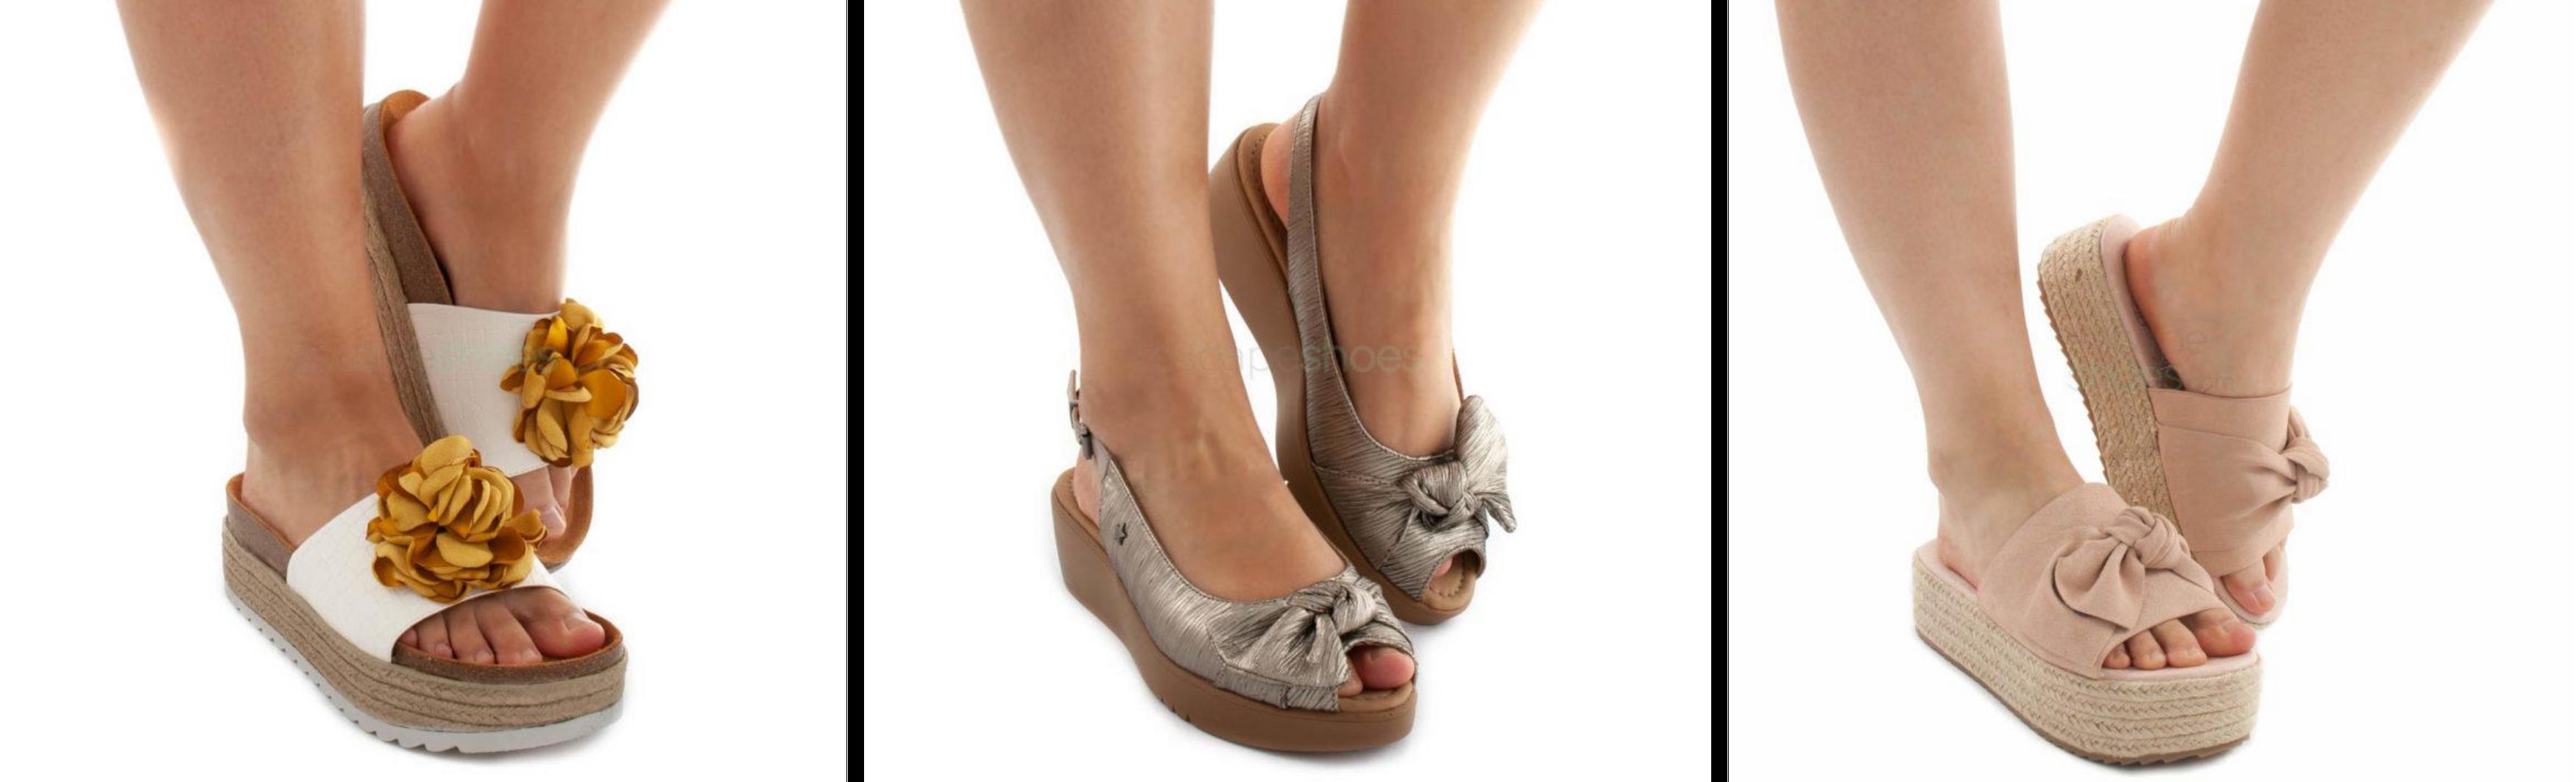 sandalias confortaveis verao